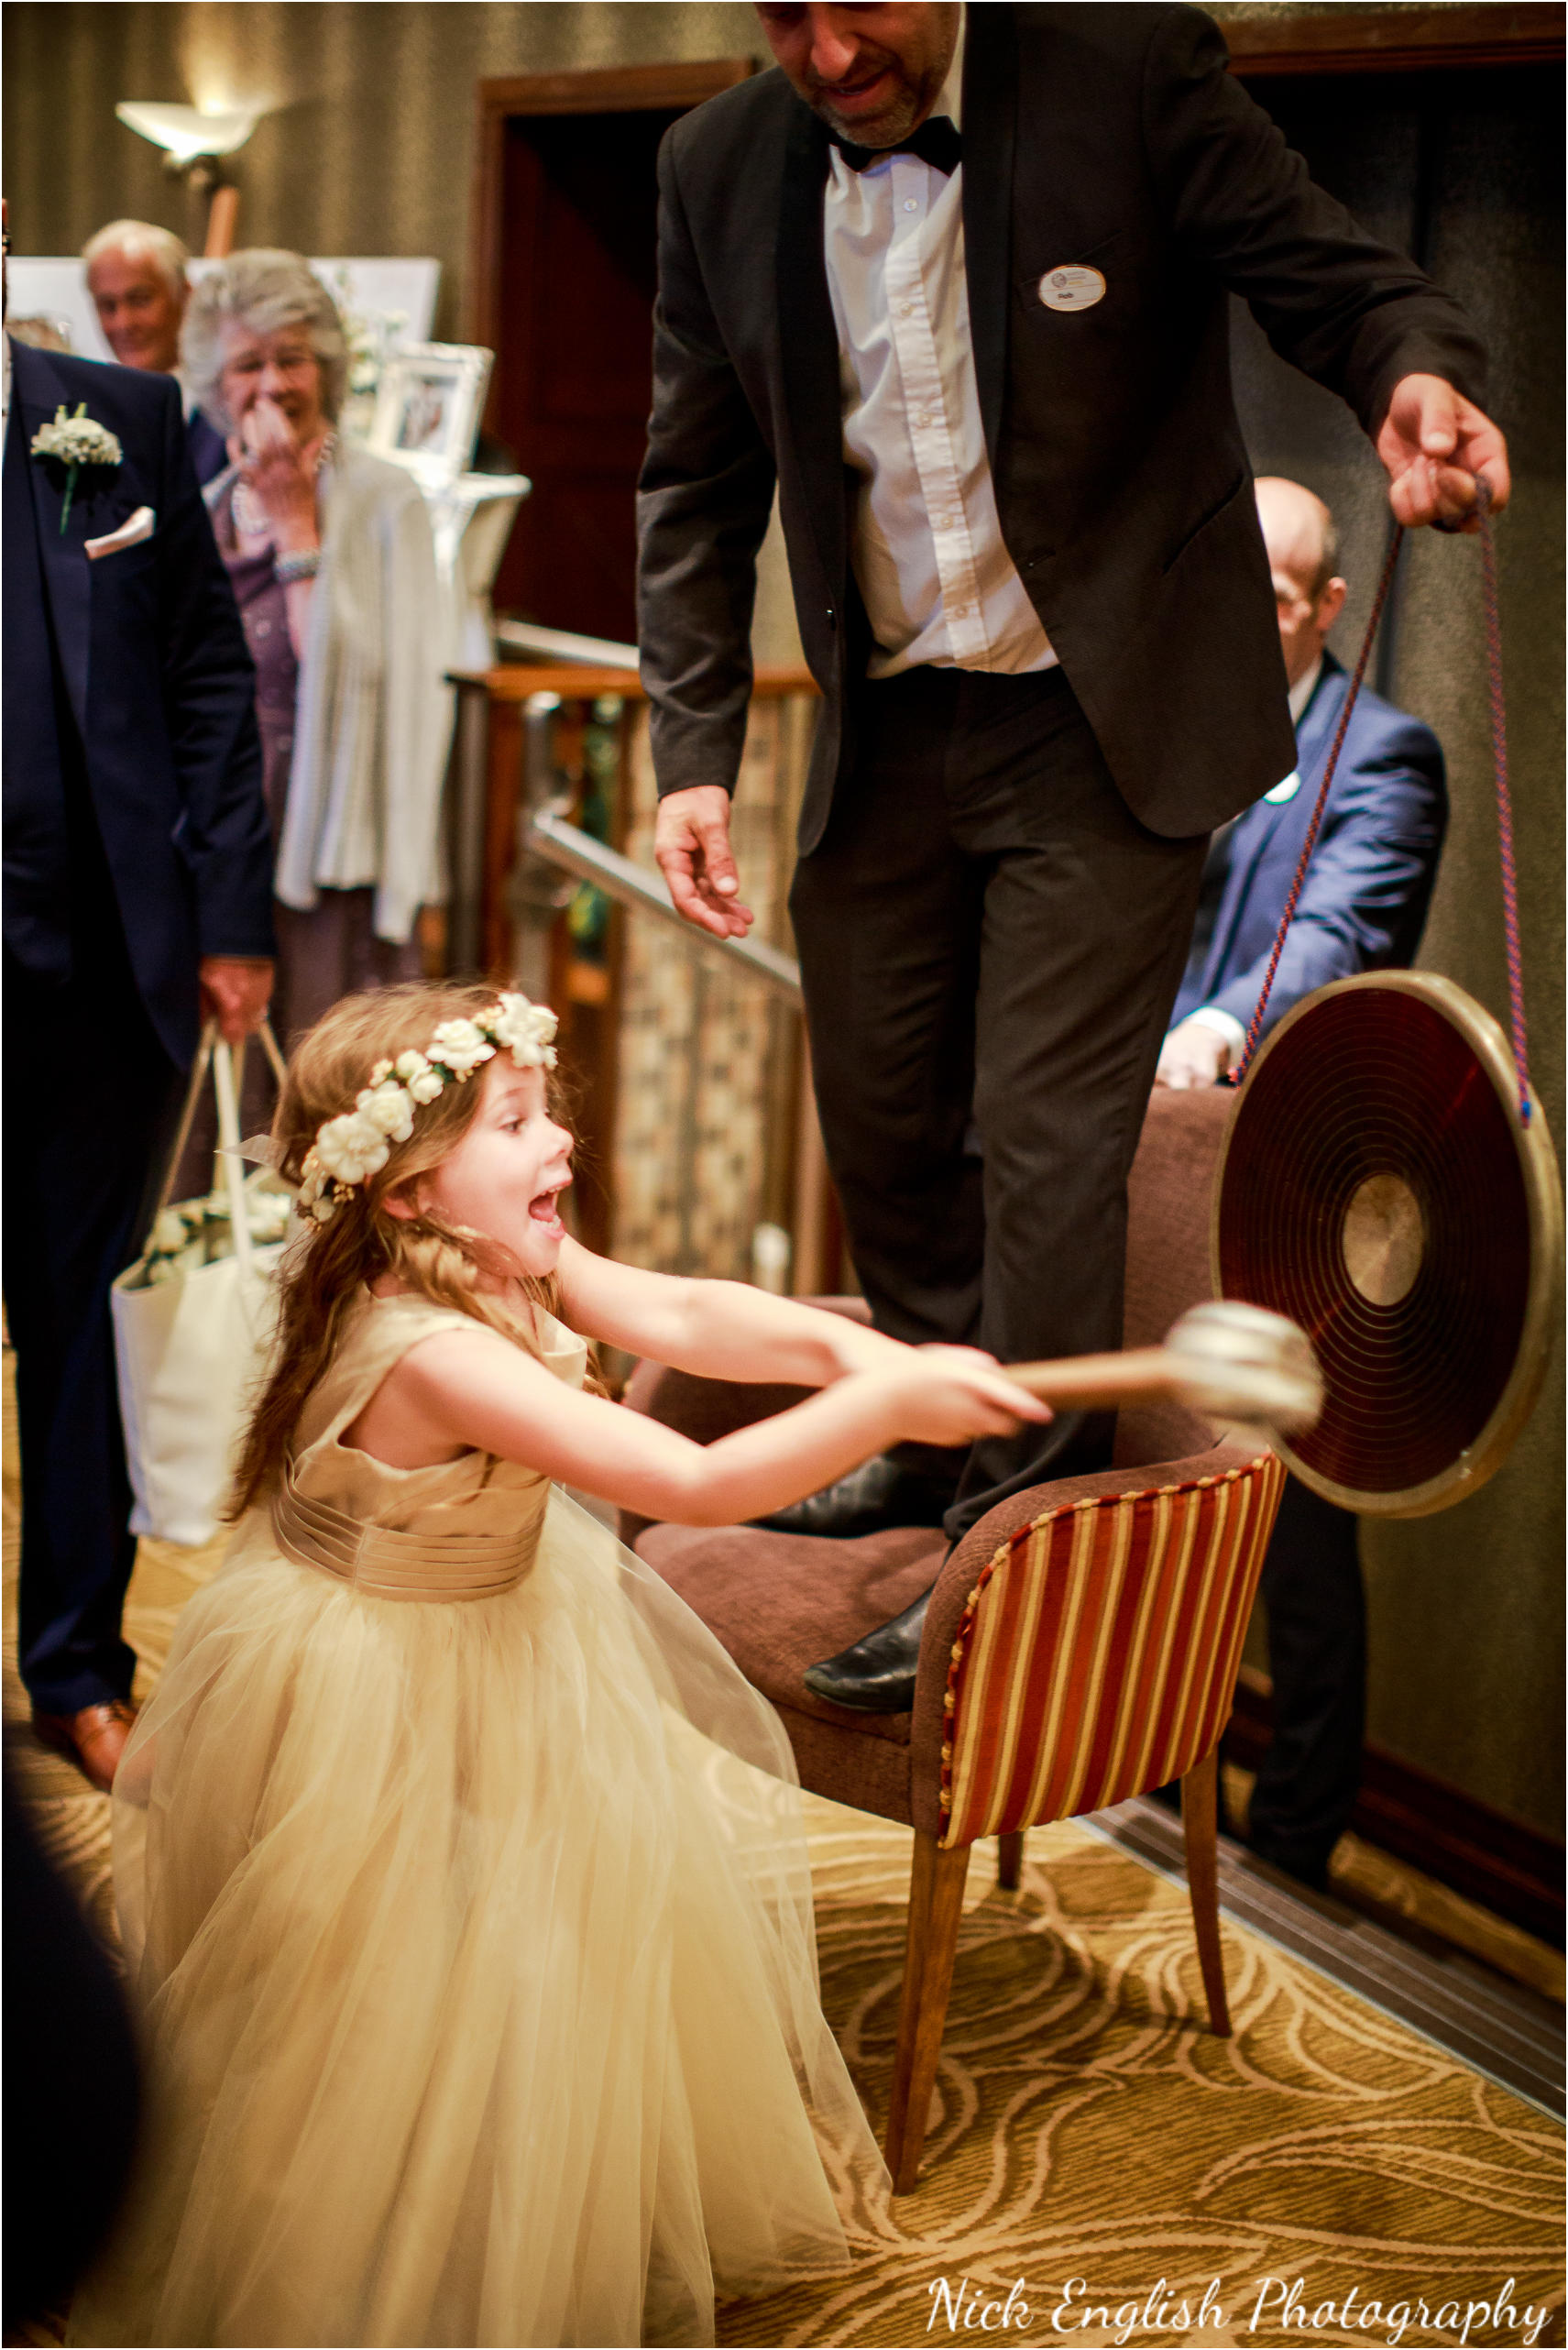 Emily David Wedding Photographs at Barton Grange Preston by Nick English Photography 158jpg.jpeg